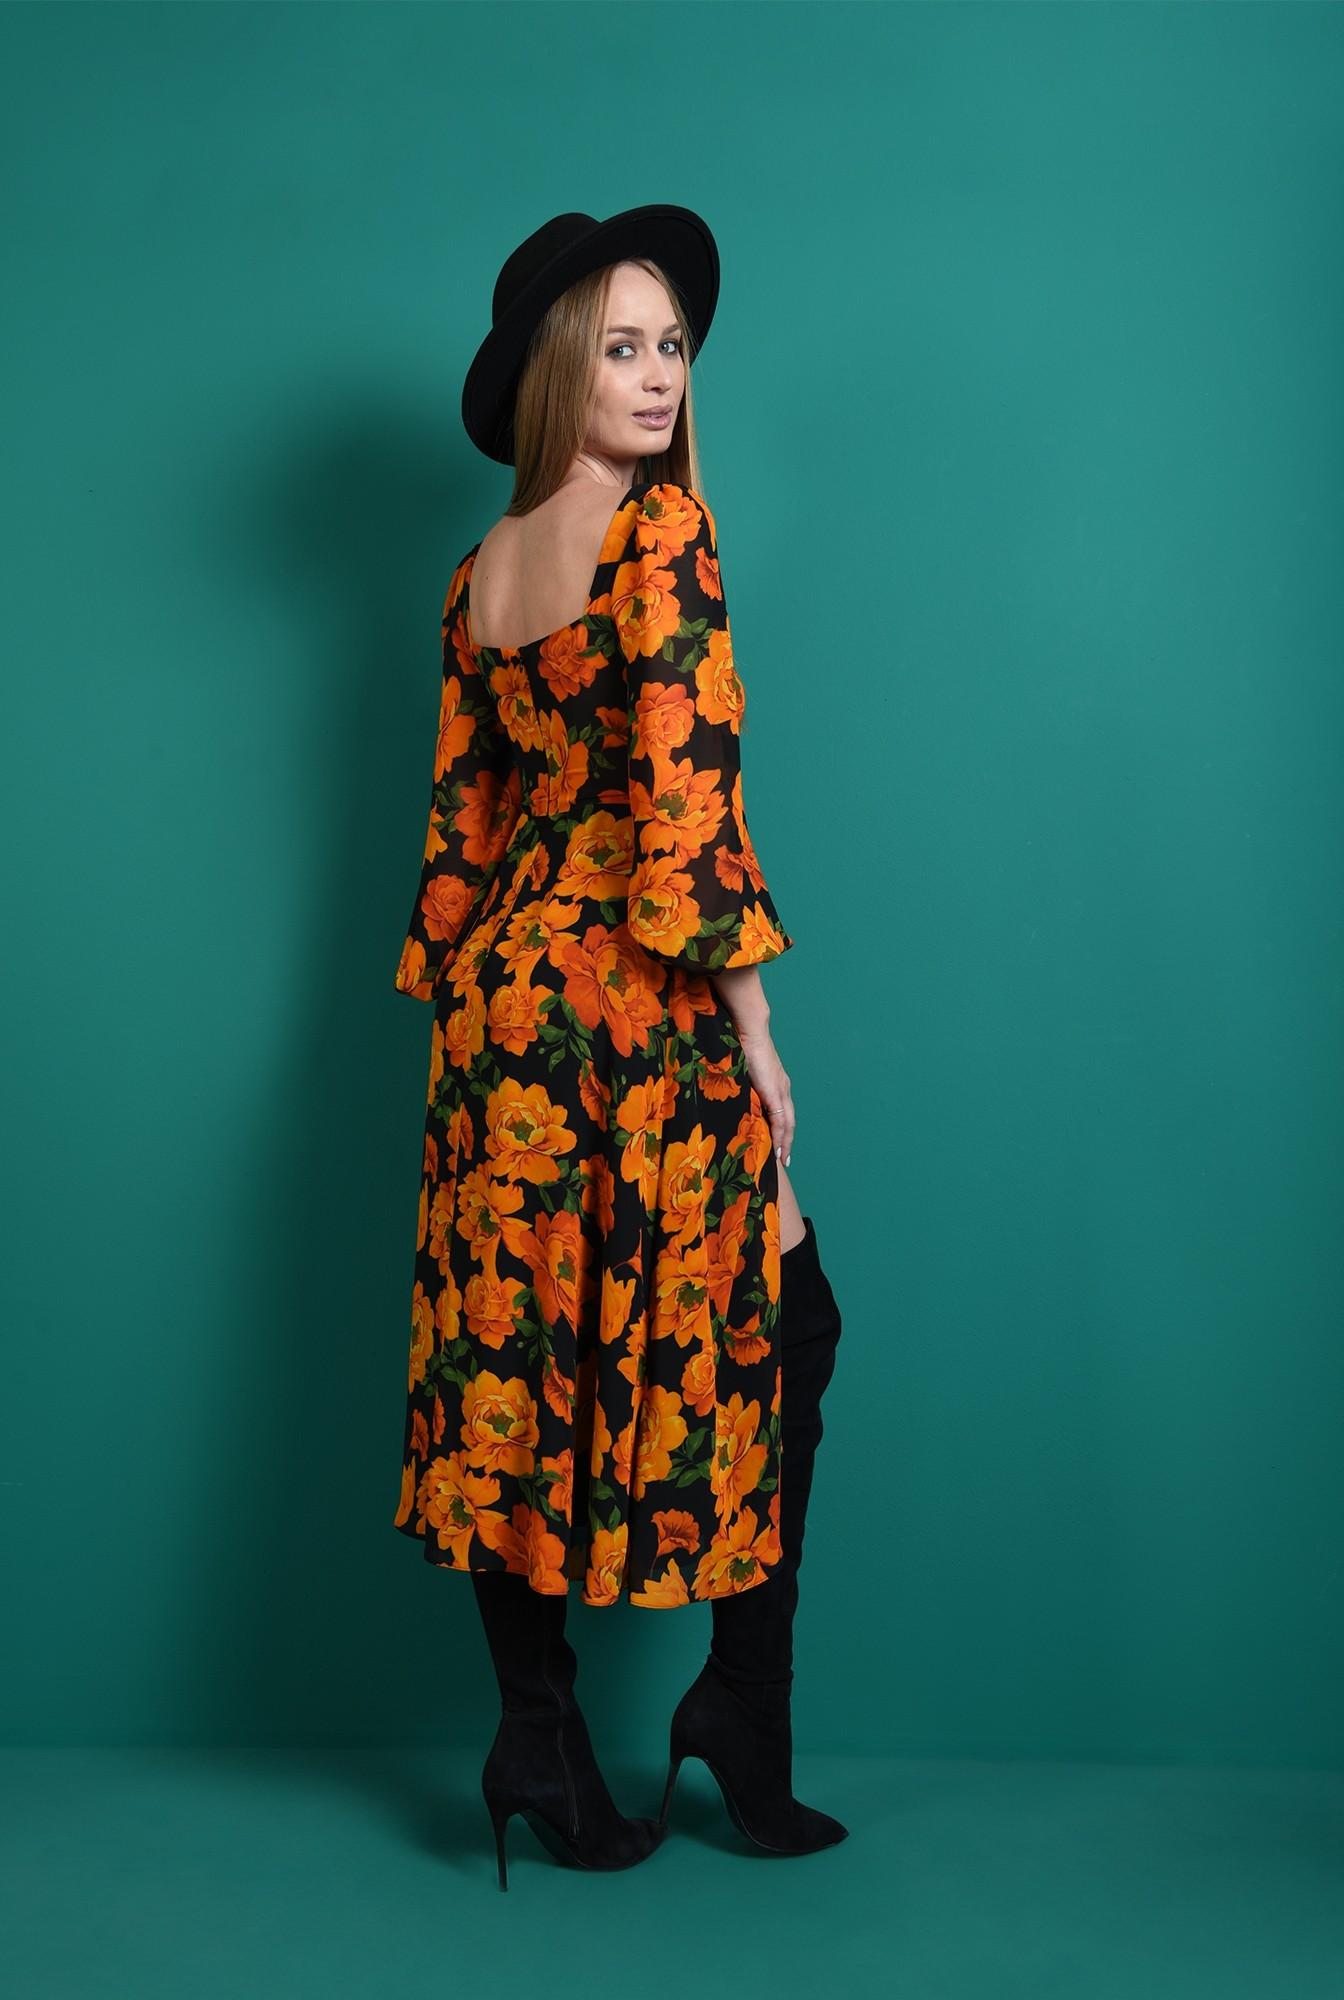 1 - rochie florala, cu bust fronsat, cu accesoriu